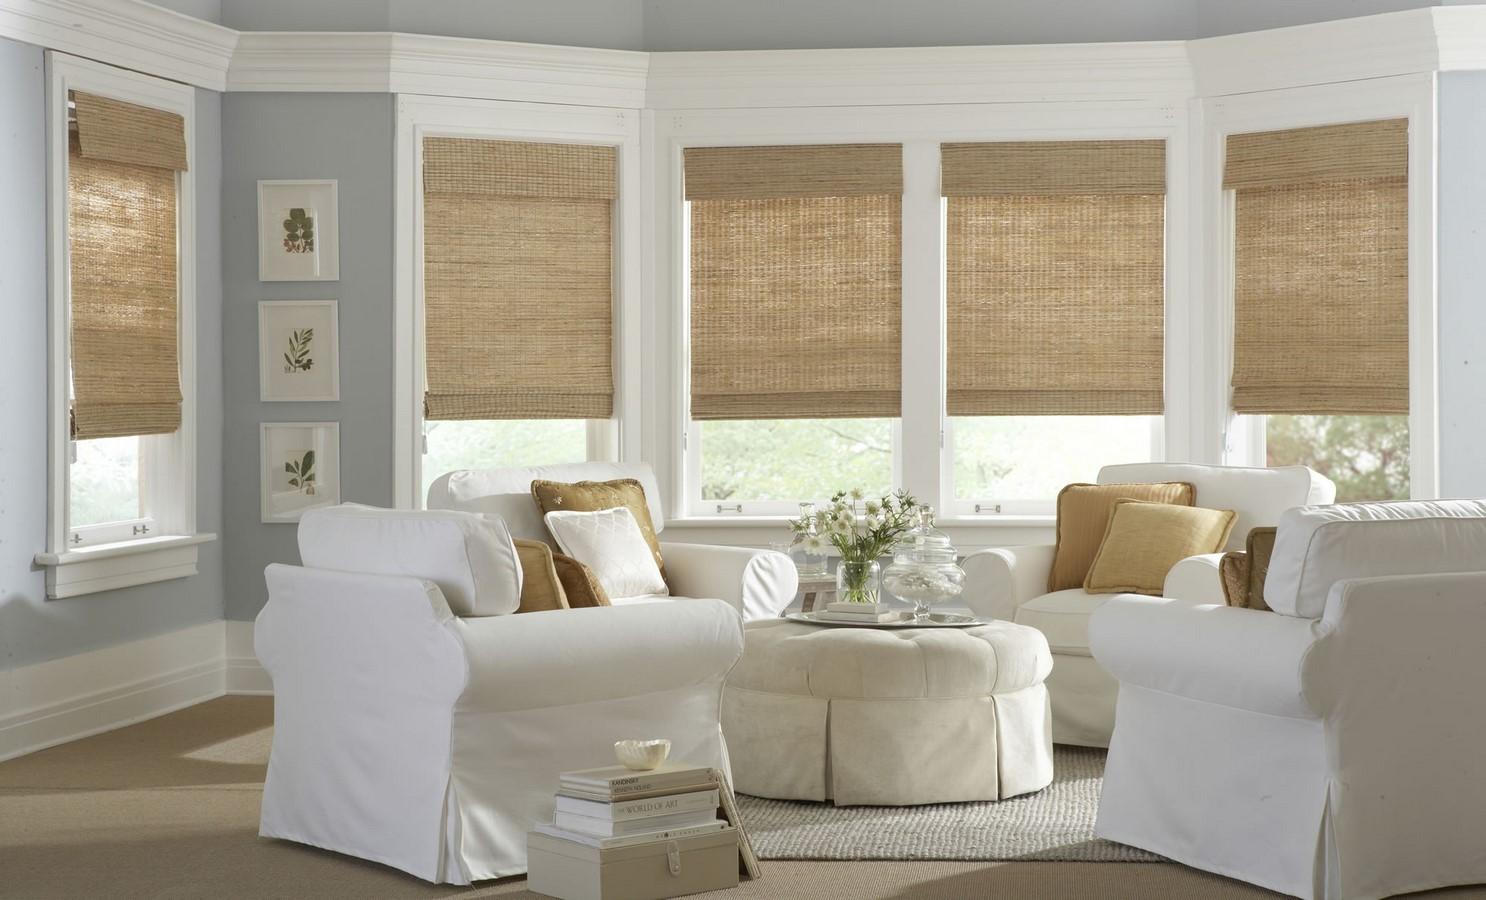 Don't skimp on window dressings - Sheet2